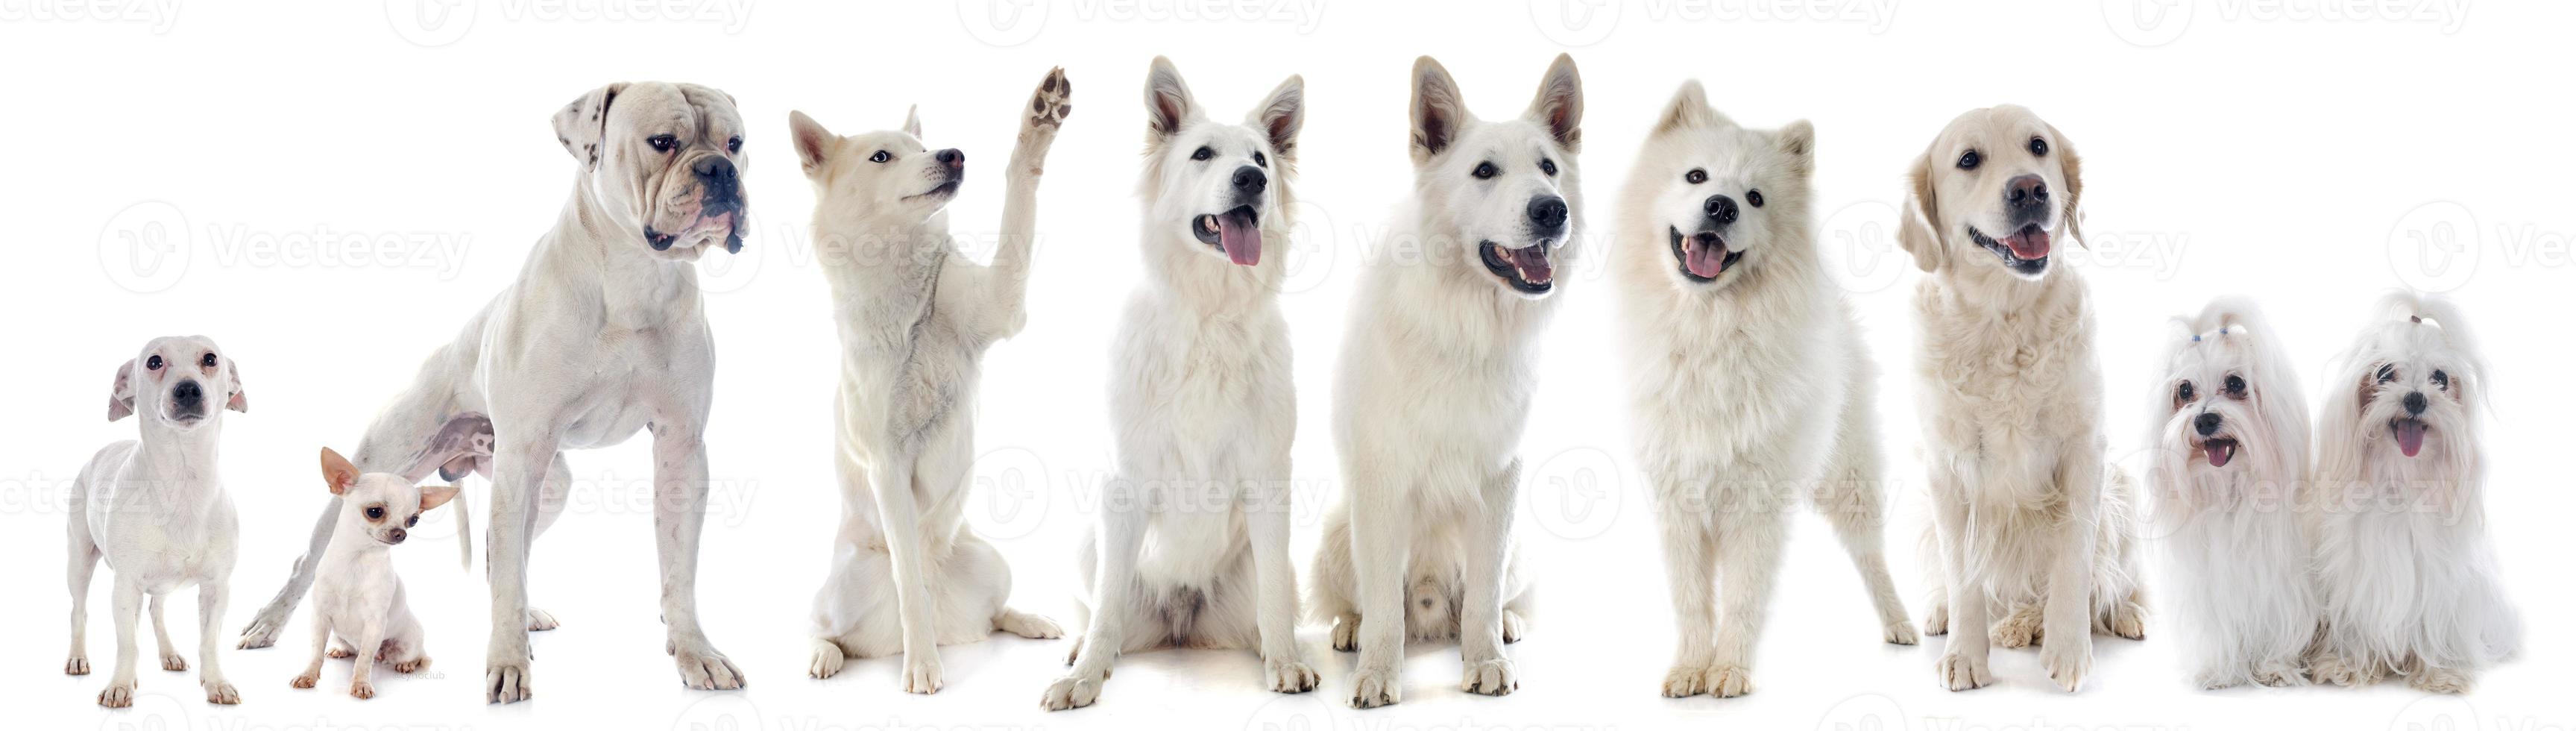 cani bianchi foto